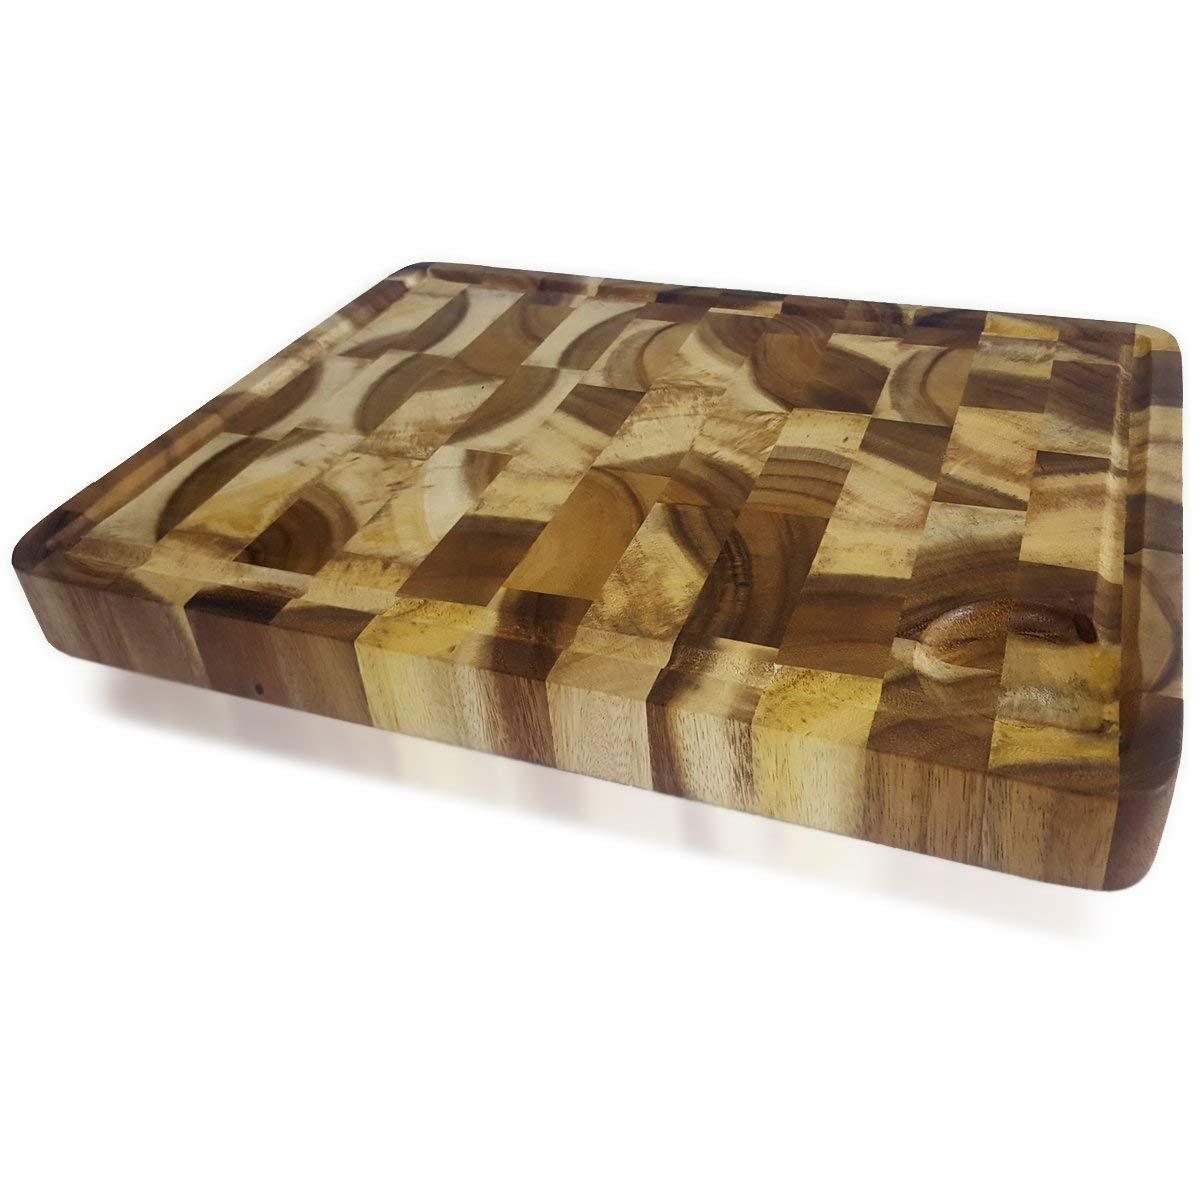 roro Rectangular End-Grain Acacia Kitchen Wood Cutting Board and Block by roro (Image #2)